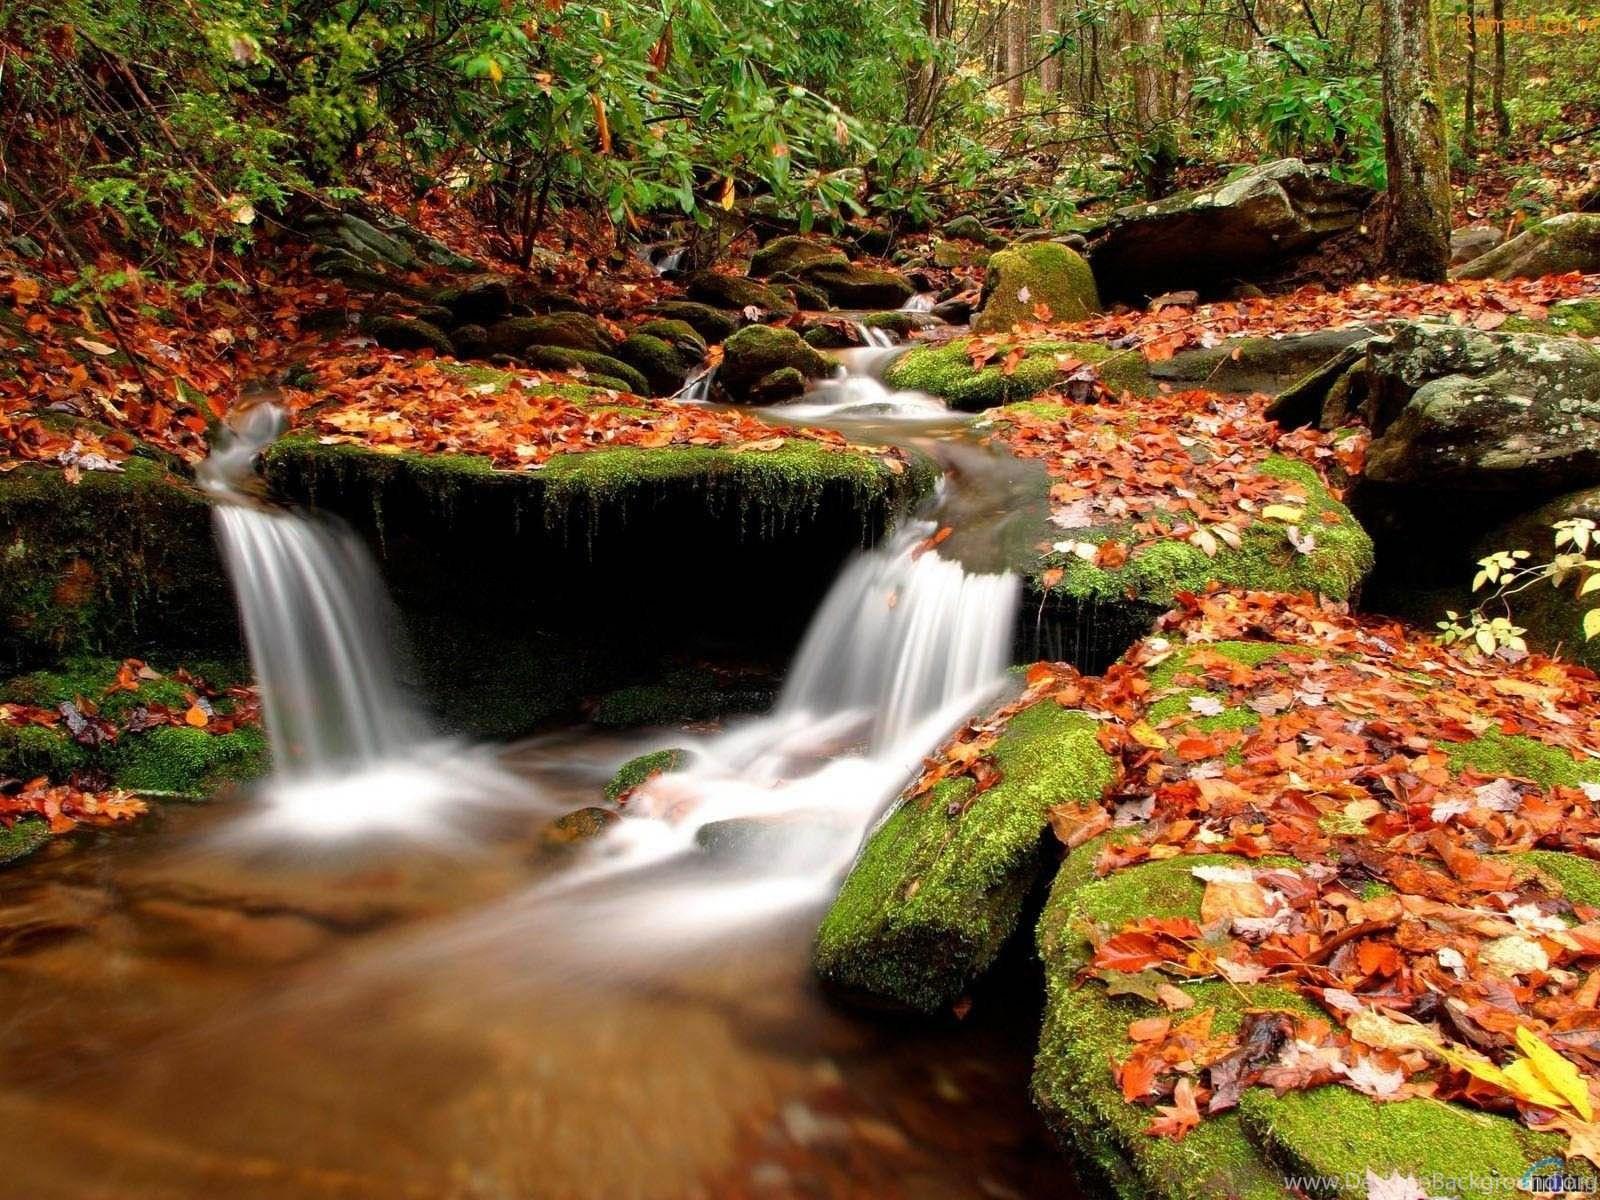 Top 3d Full Hd Nature Wallpaper Images For Pinterest Desktop